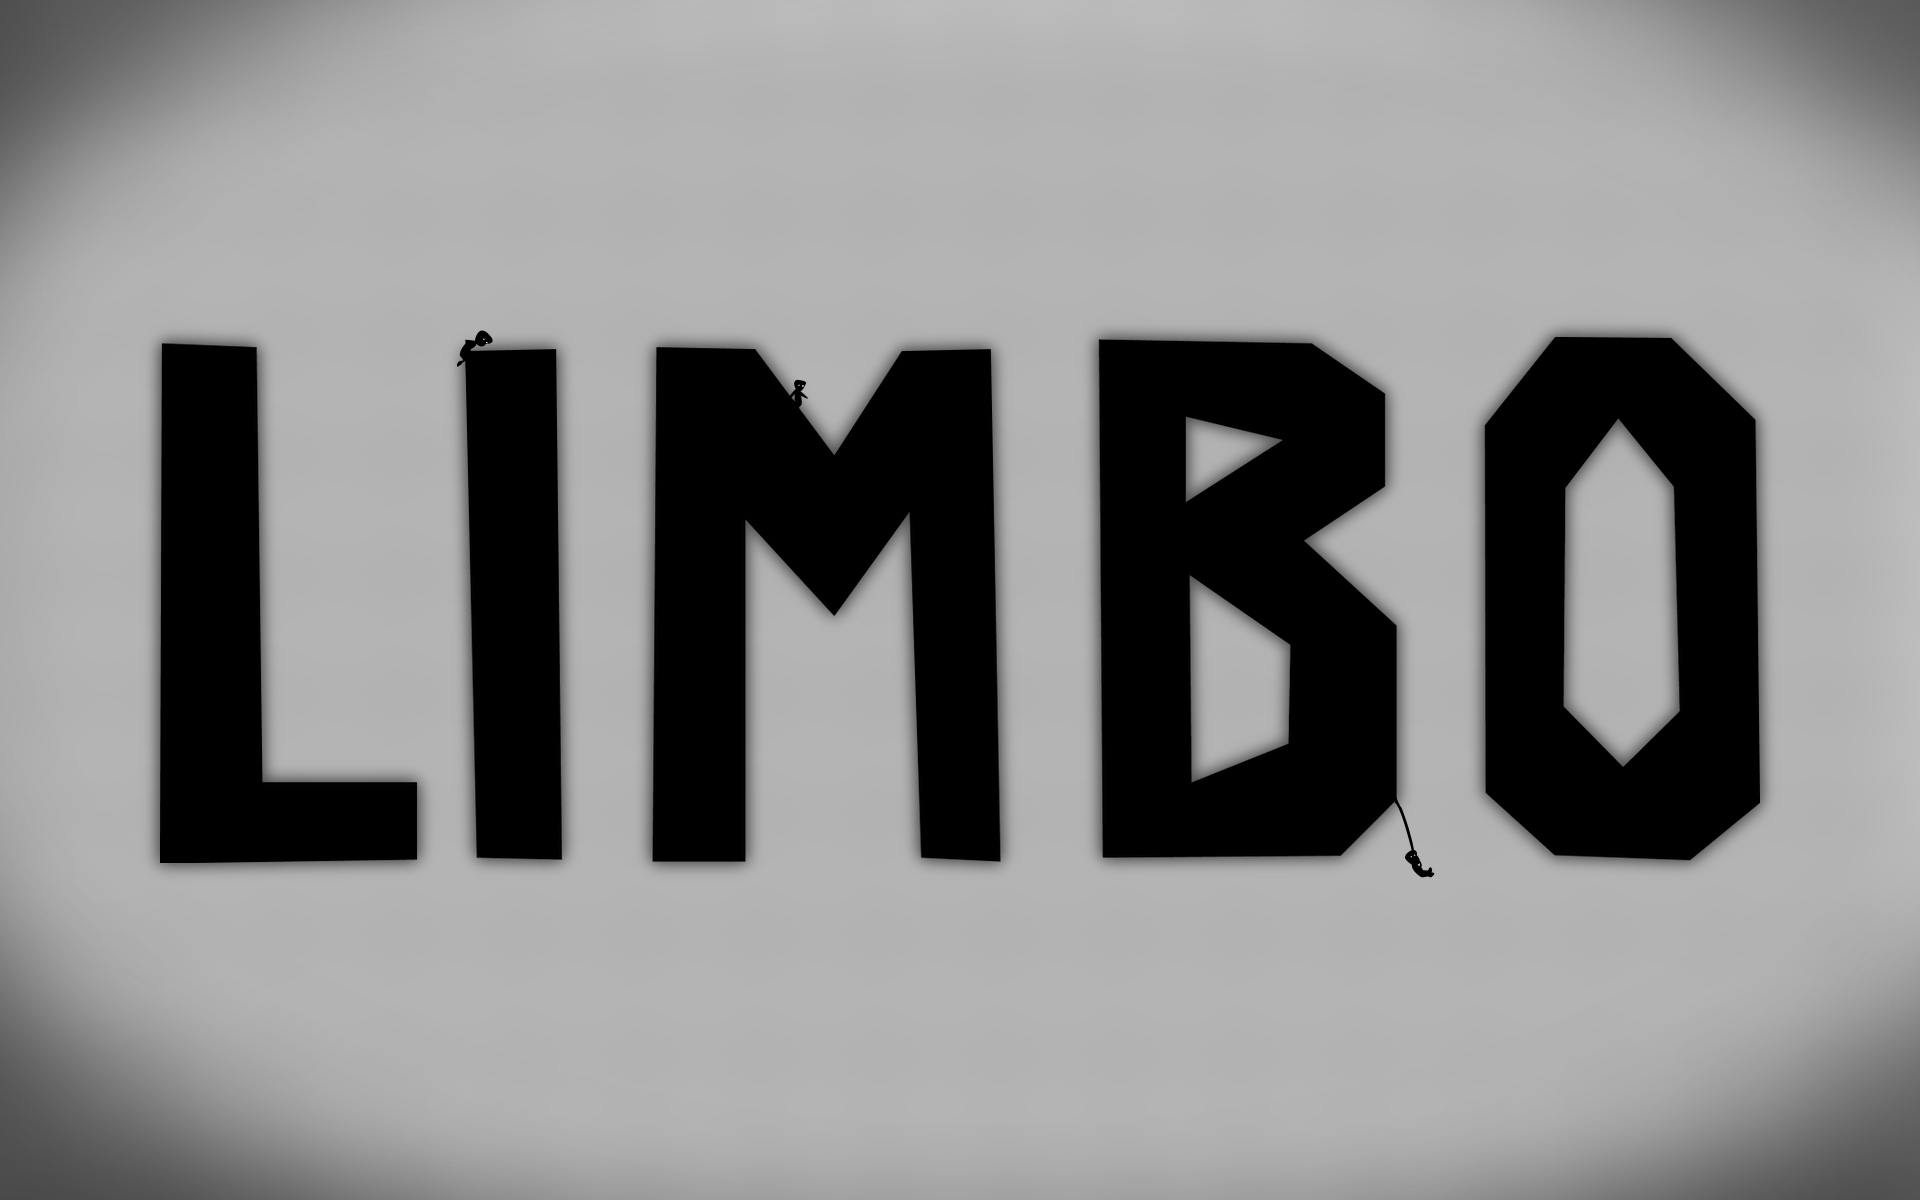 Limbo Wallpaper By Diegodoes On Deviantart